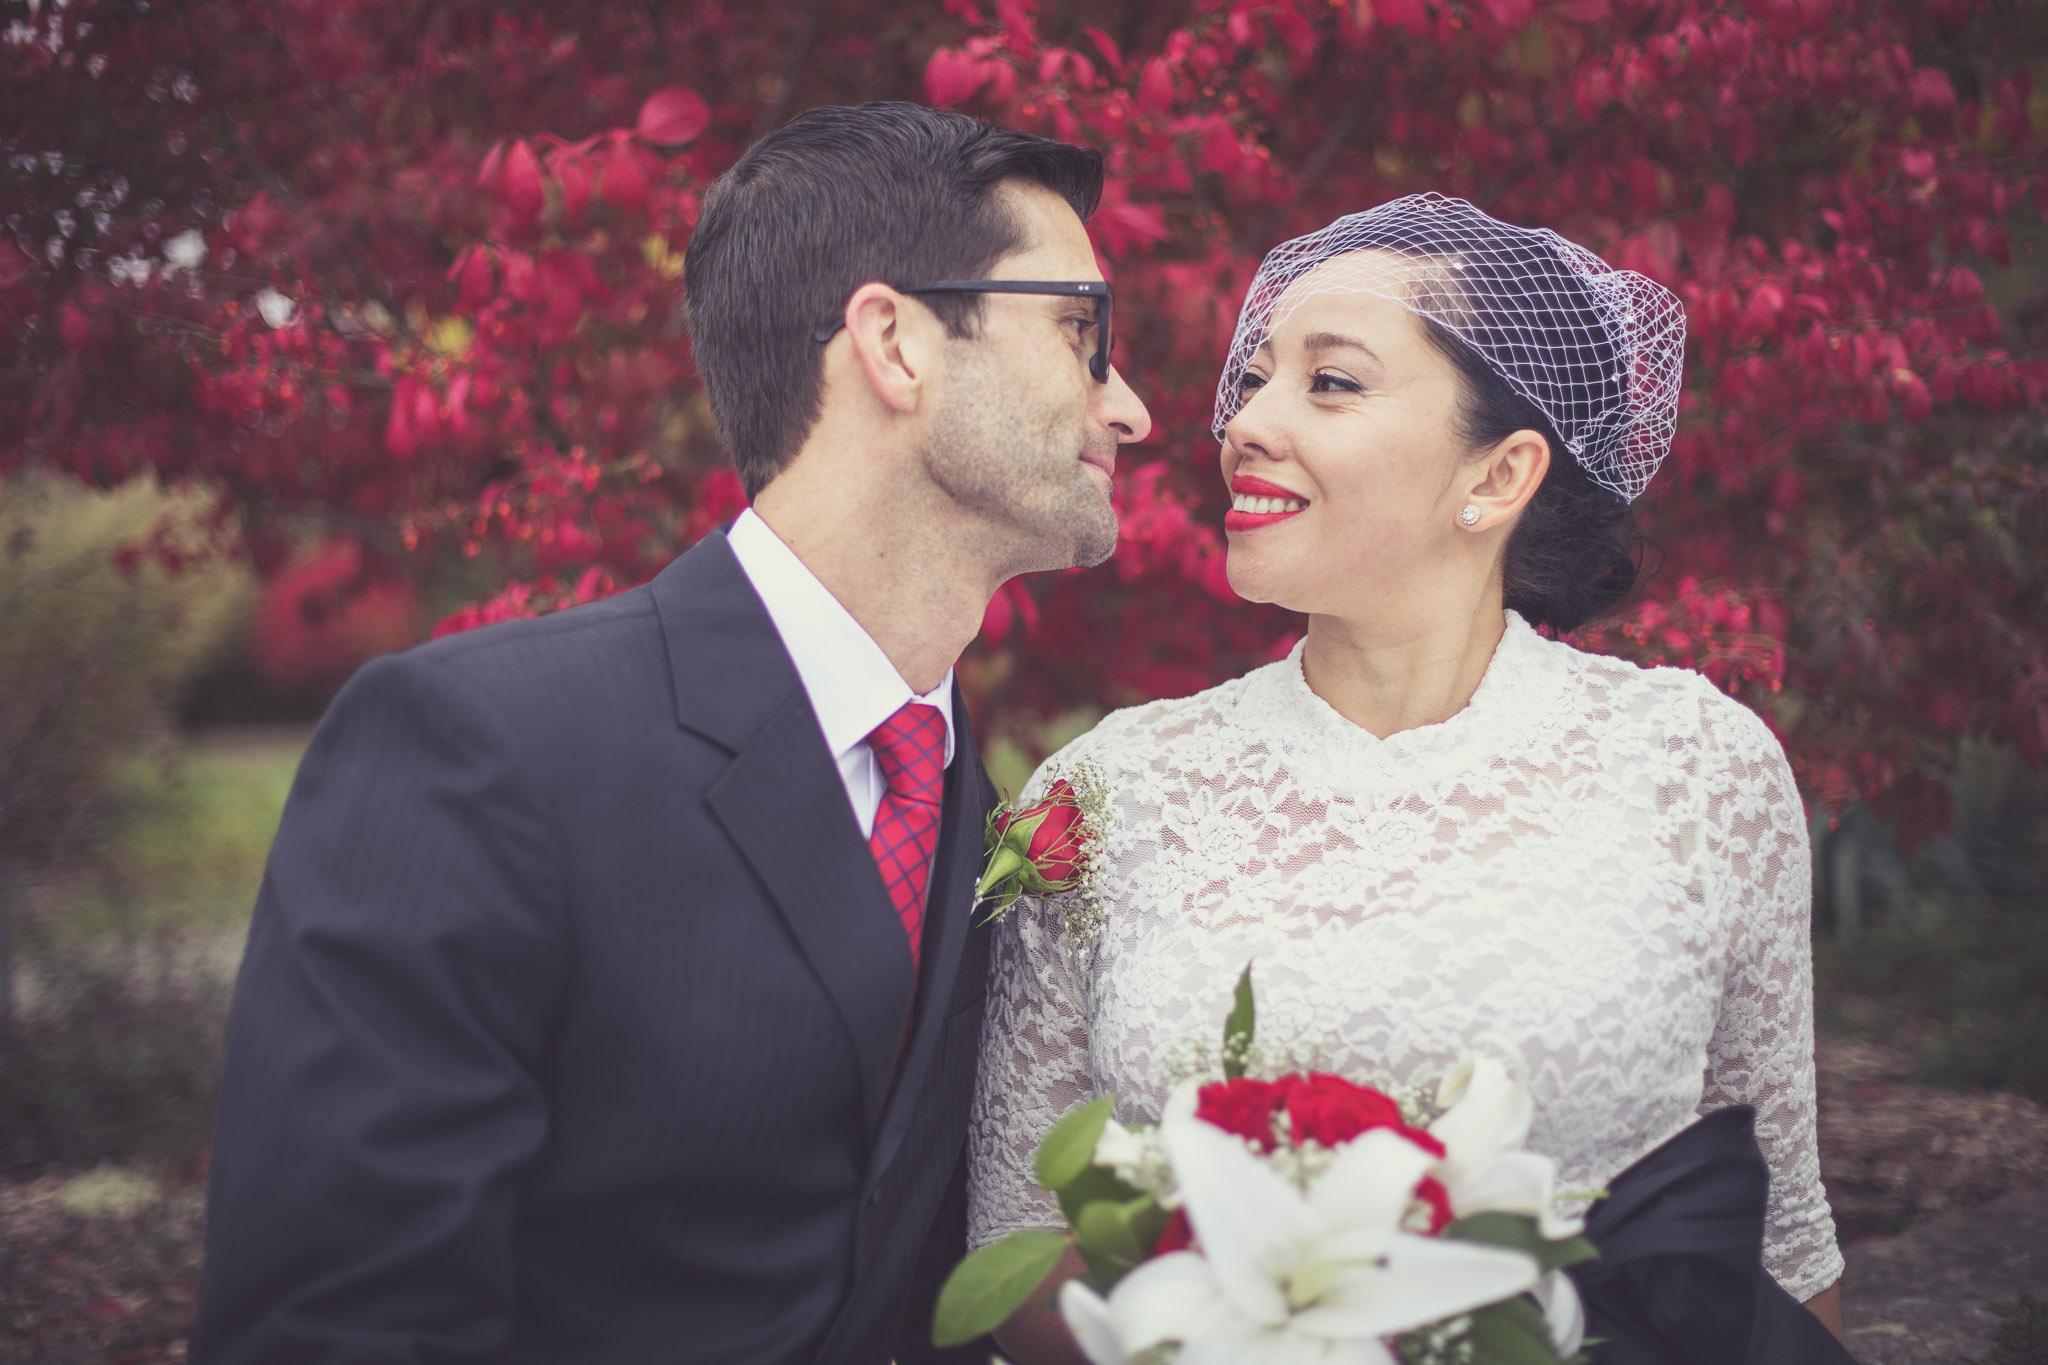 Geovanna-JP-wedding-shayne-gray-web-0758.jpg